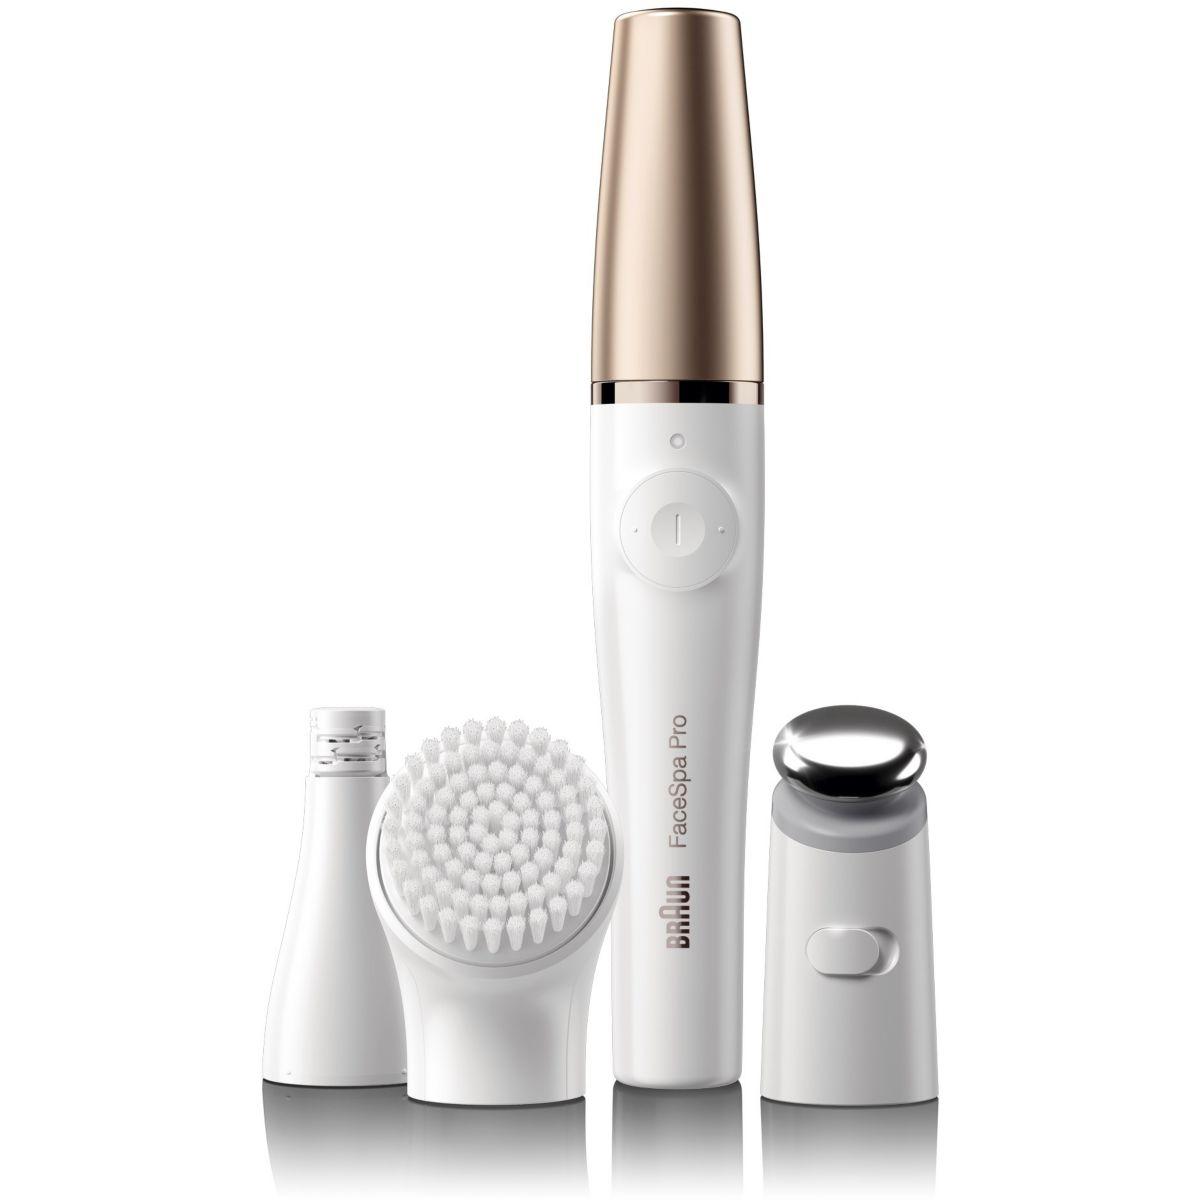 Brosse nettoyante visage BRAUN FaceSpa Pro 911 + brosse visage